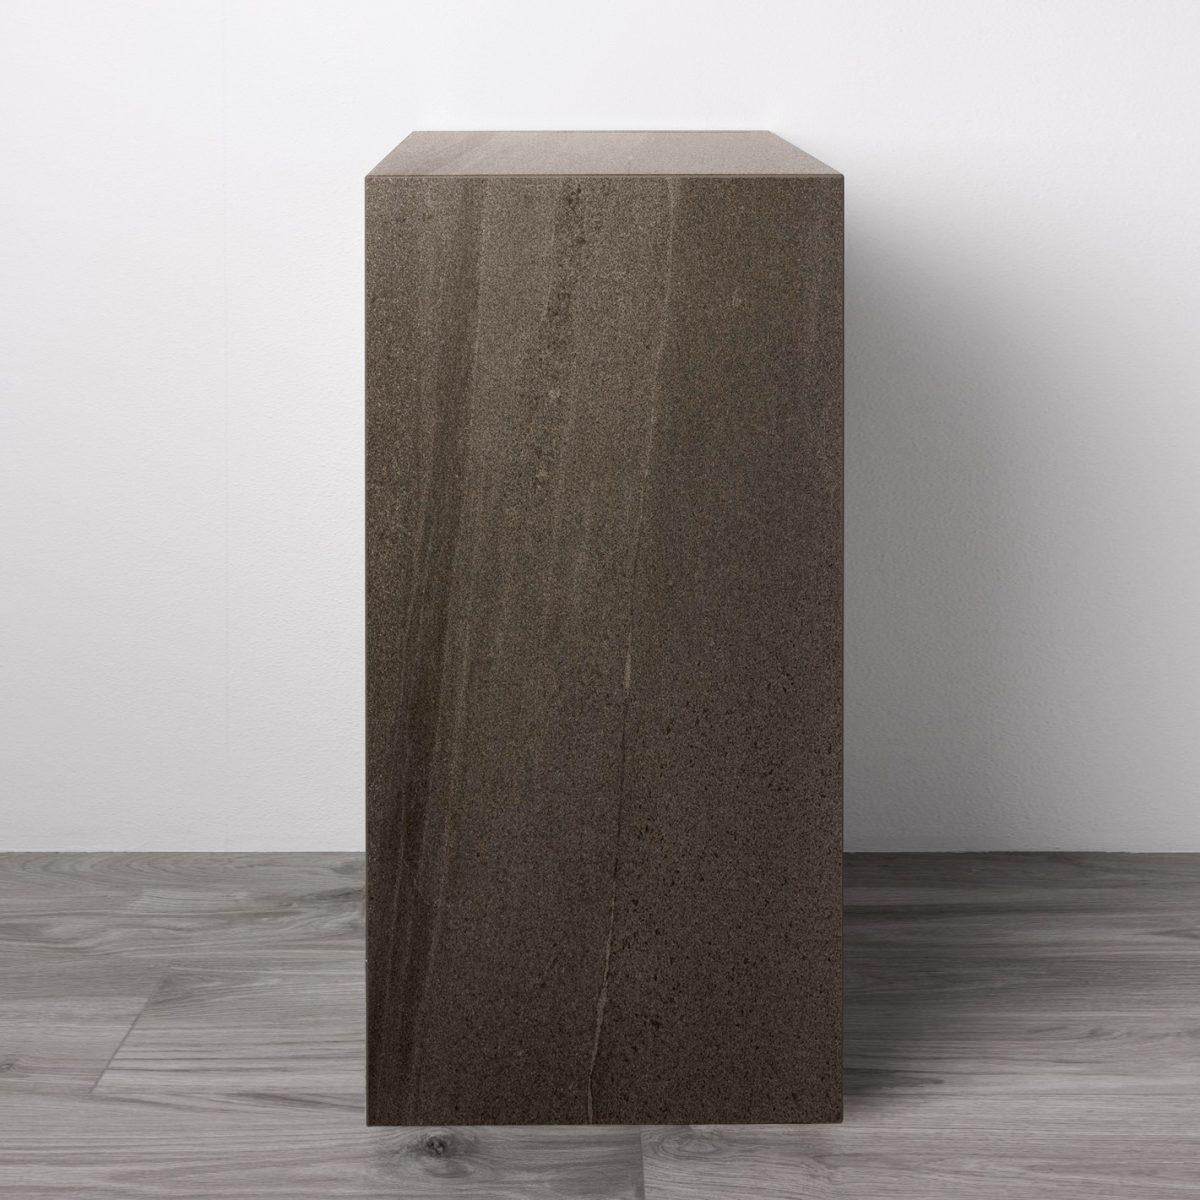 Basalt Stone – Moka Basalt